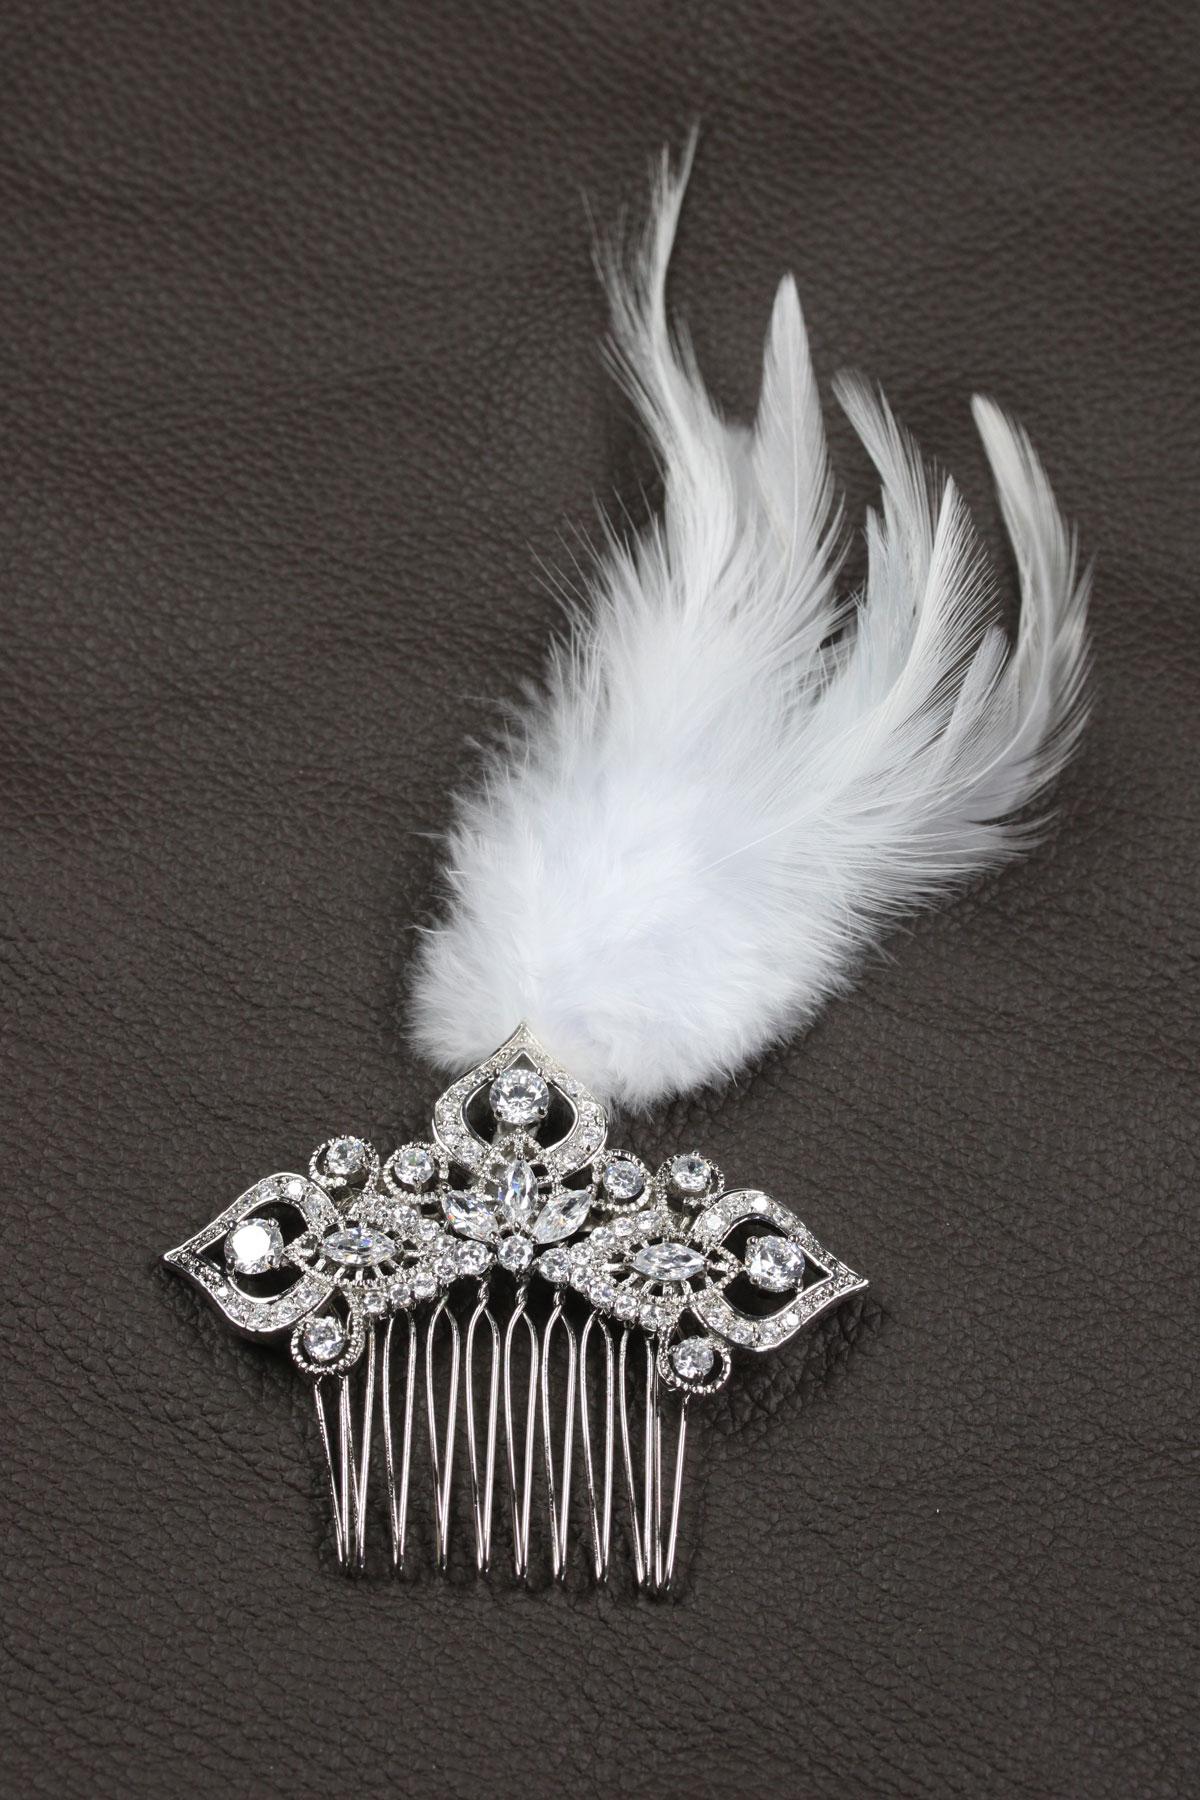 Taj hair comb